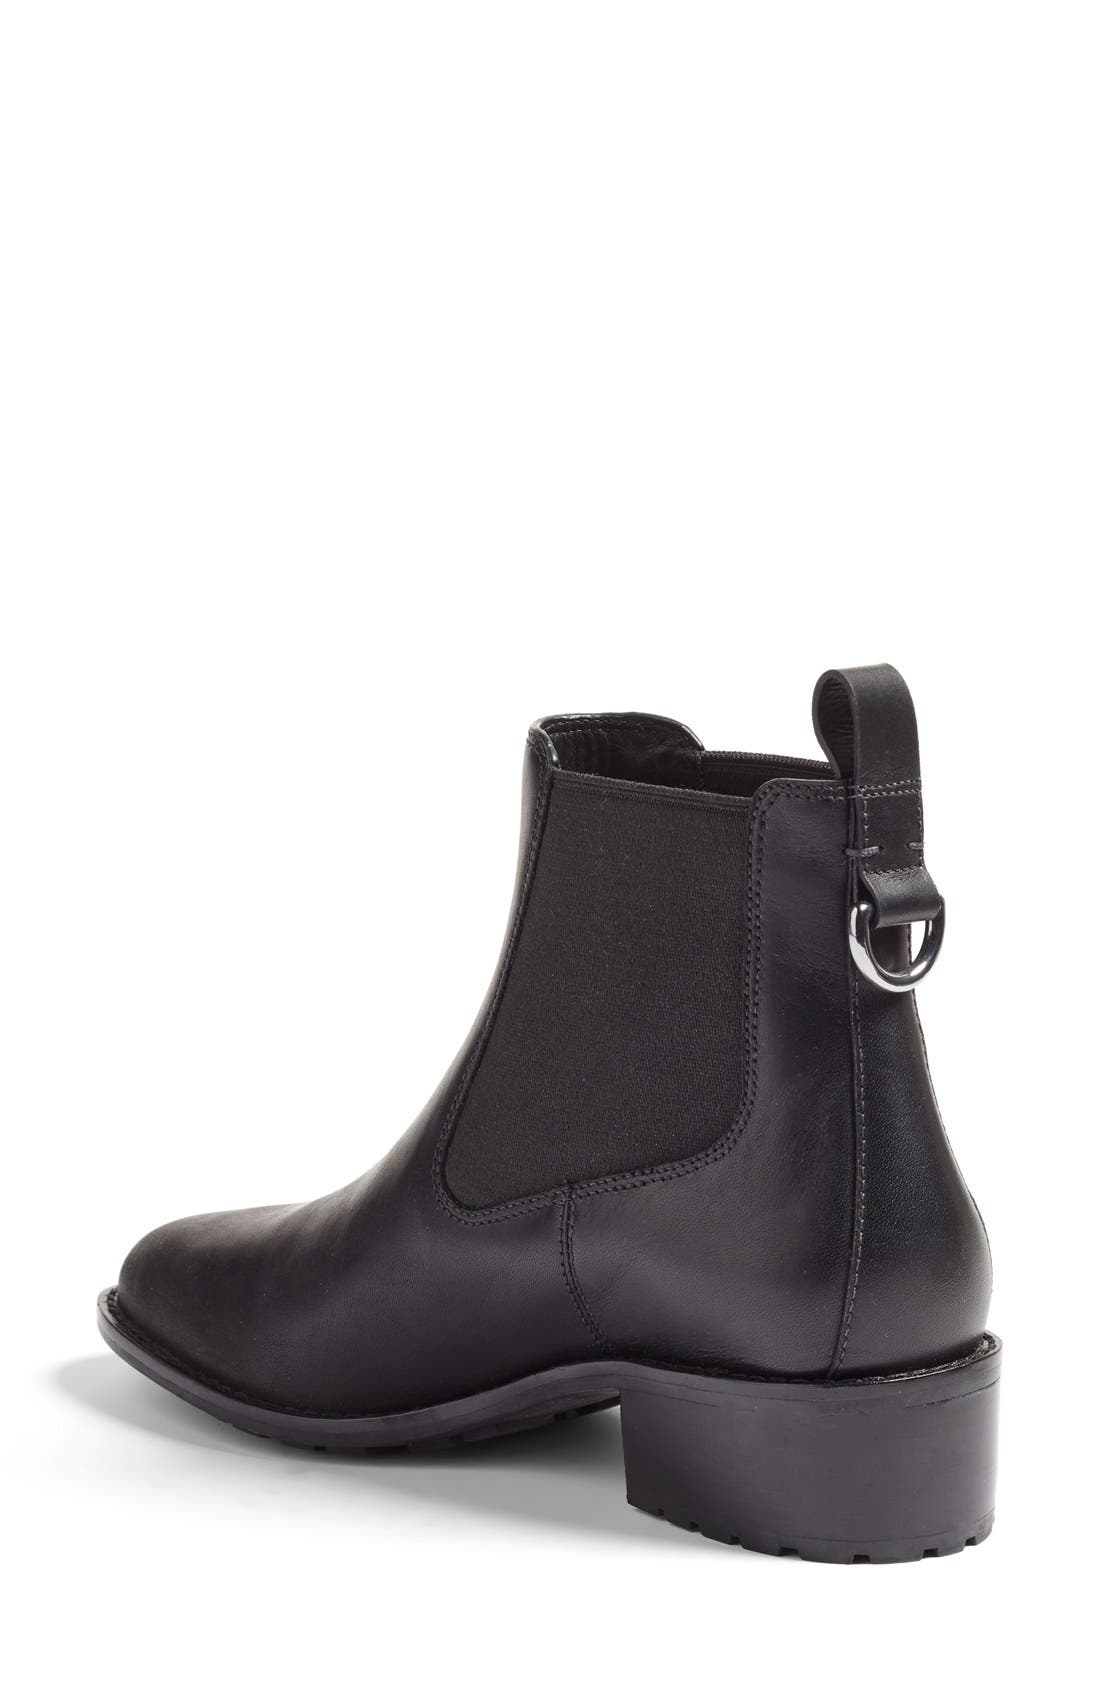 COLE HAAN, Newburg Waterproof Chelsea Boot, Alternate thumbnail 2, color, BLACK LEATHER